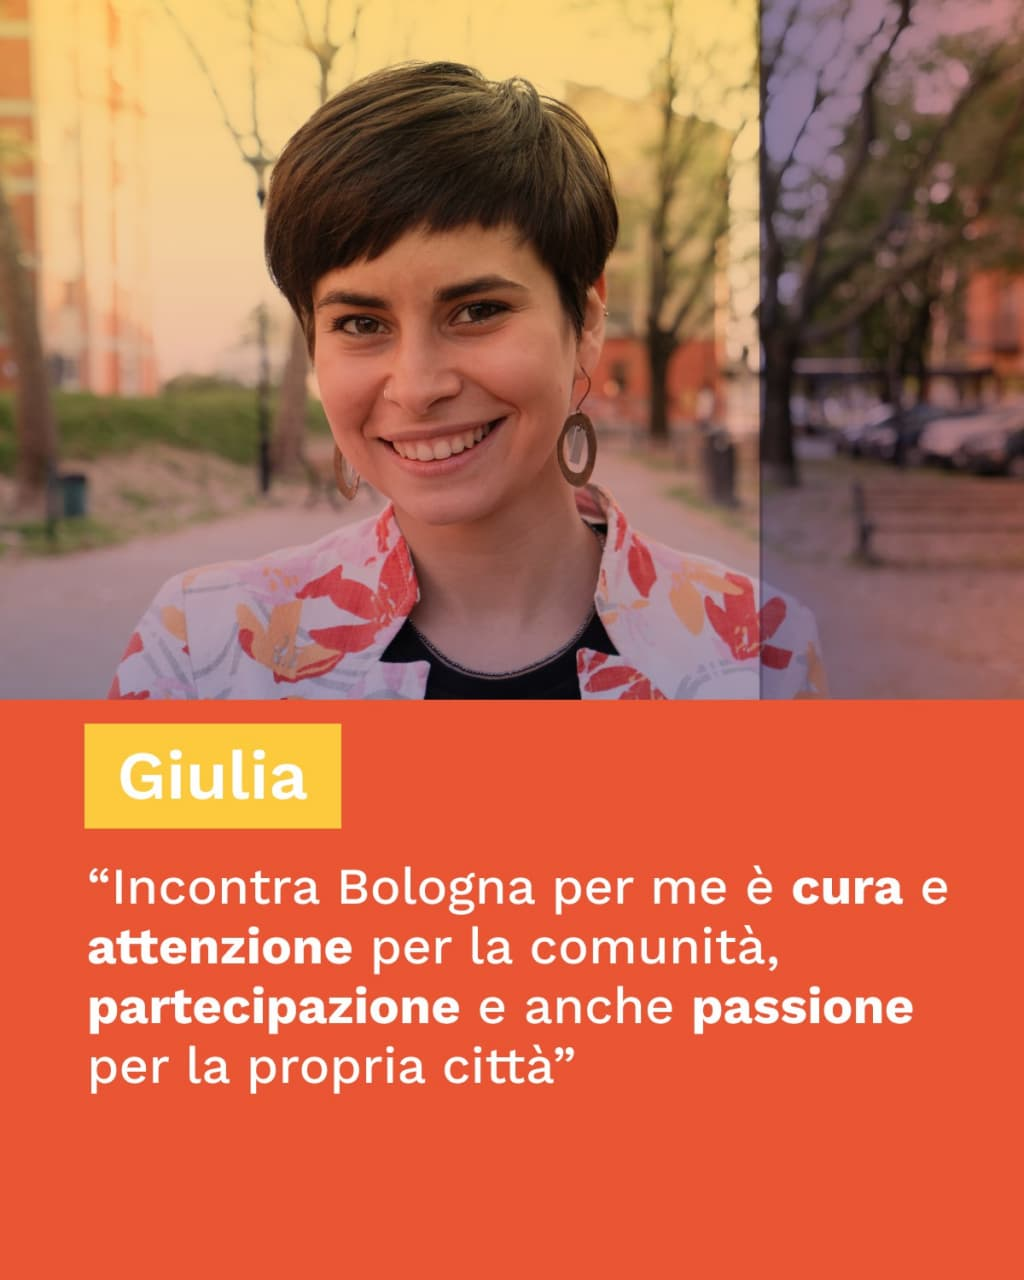 cos'è incontra bologna per Giulia